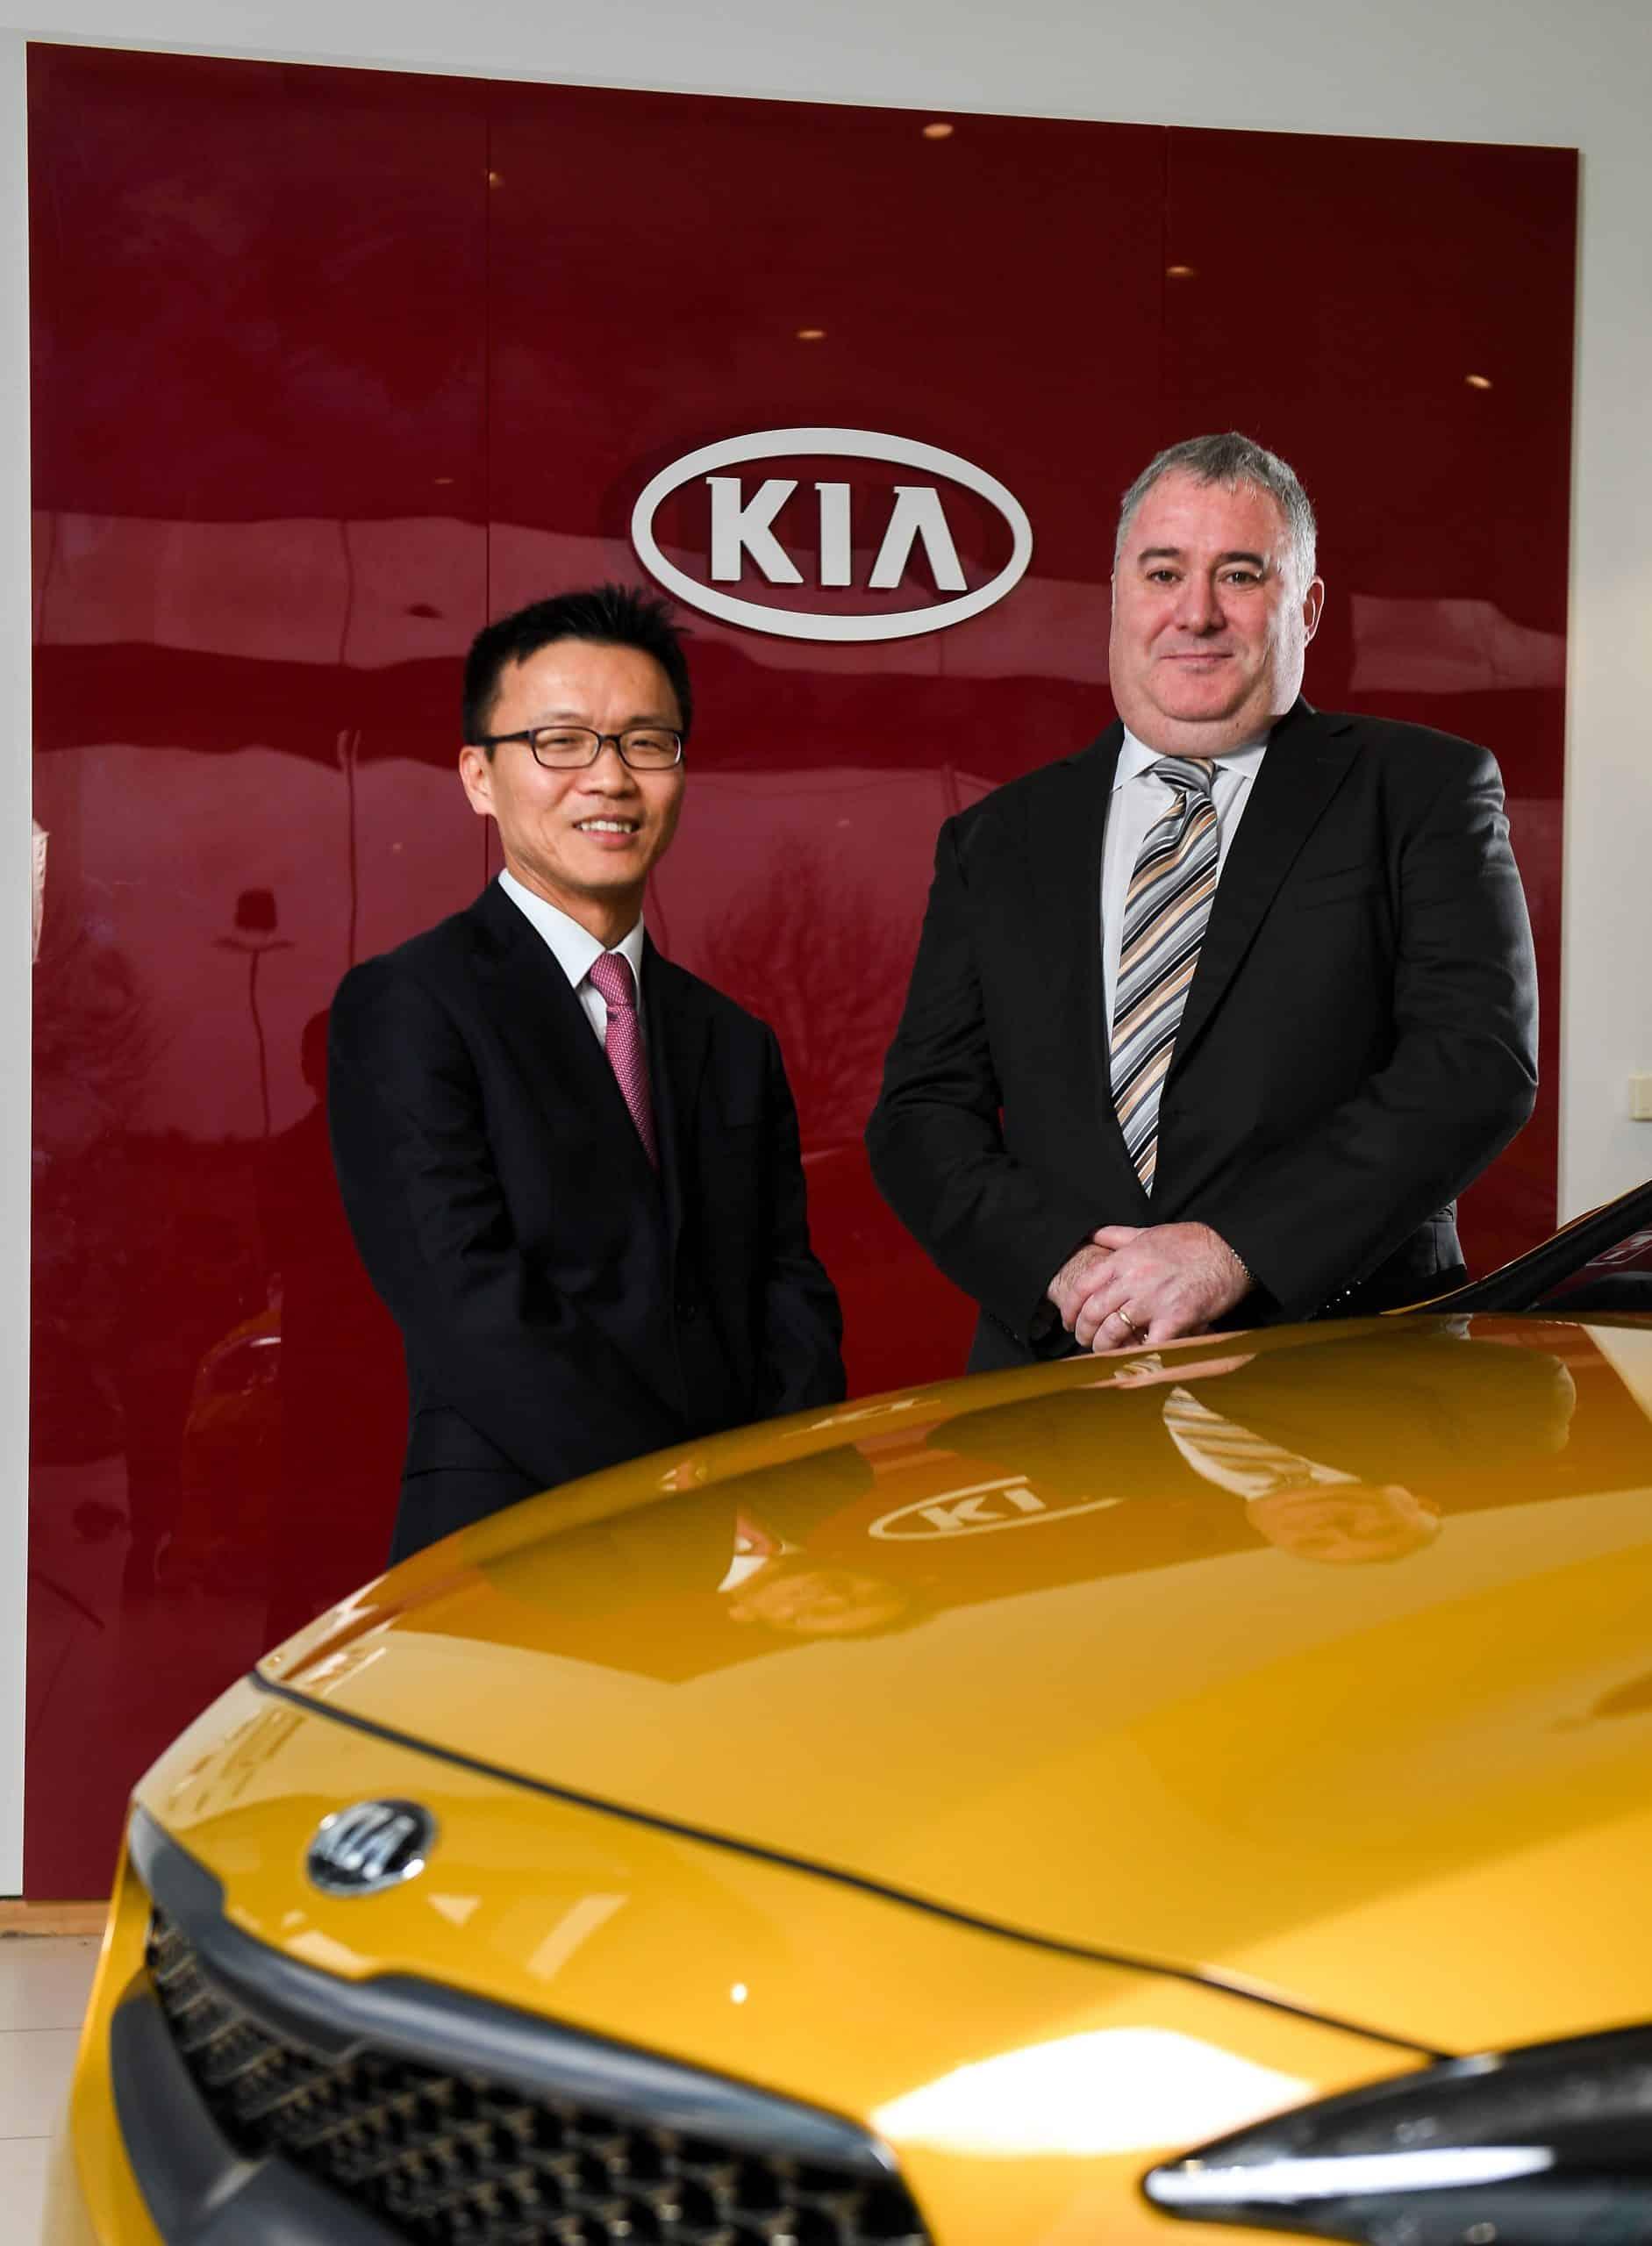 Ronan Flood Appointed MD of Kia Motors Ireland